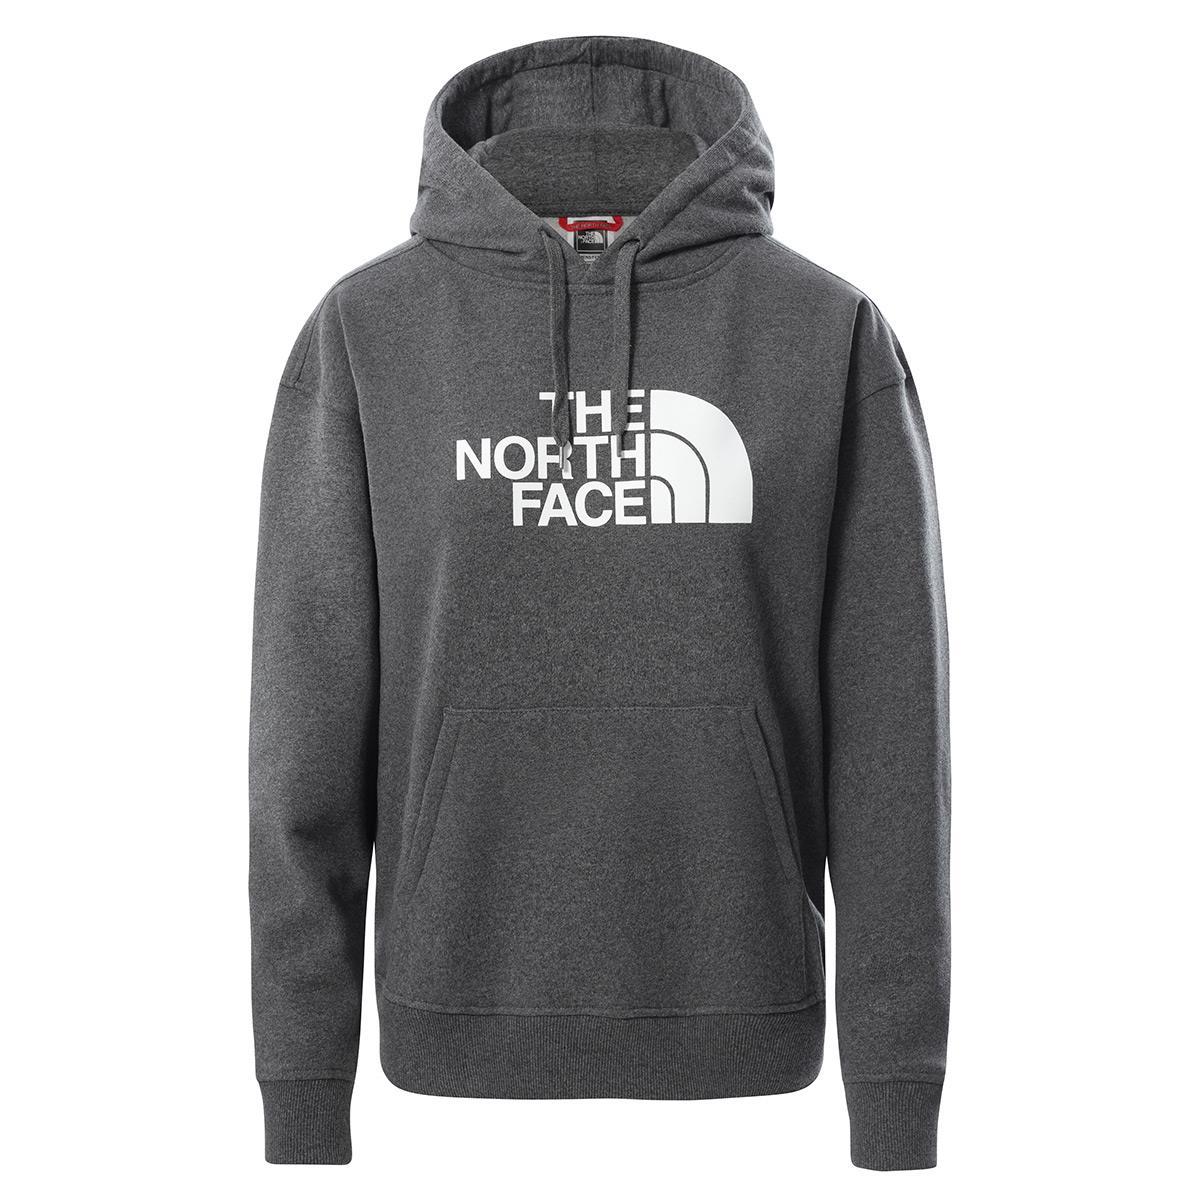 The North Face  Kadın LIGHT DREKadın PEAK HOODIE    Sweat Shirt